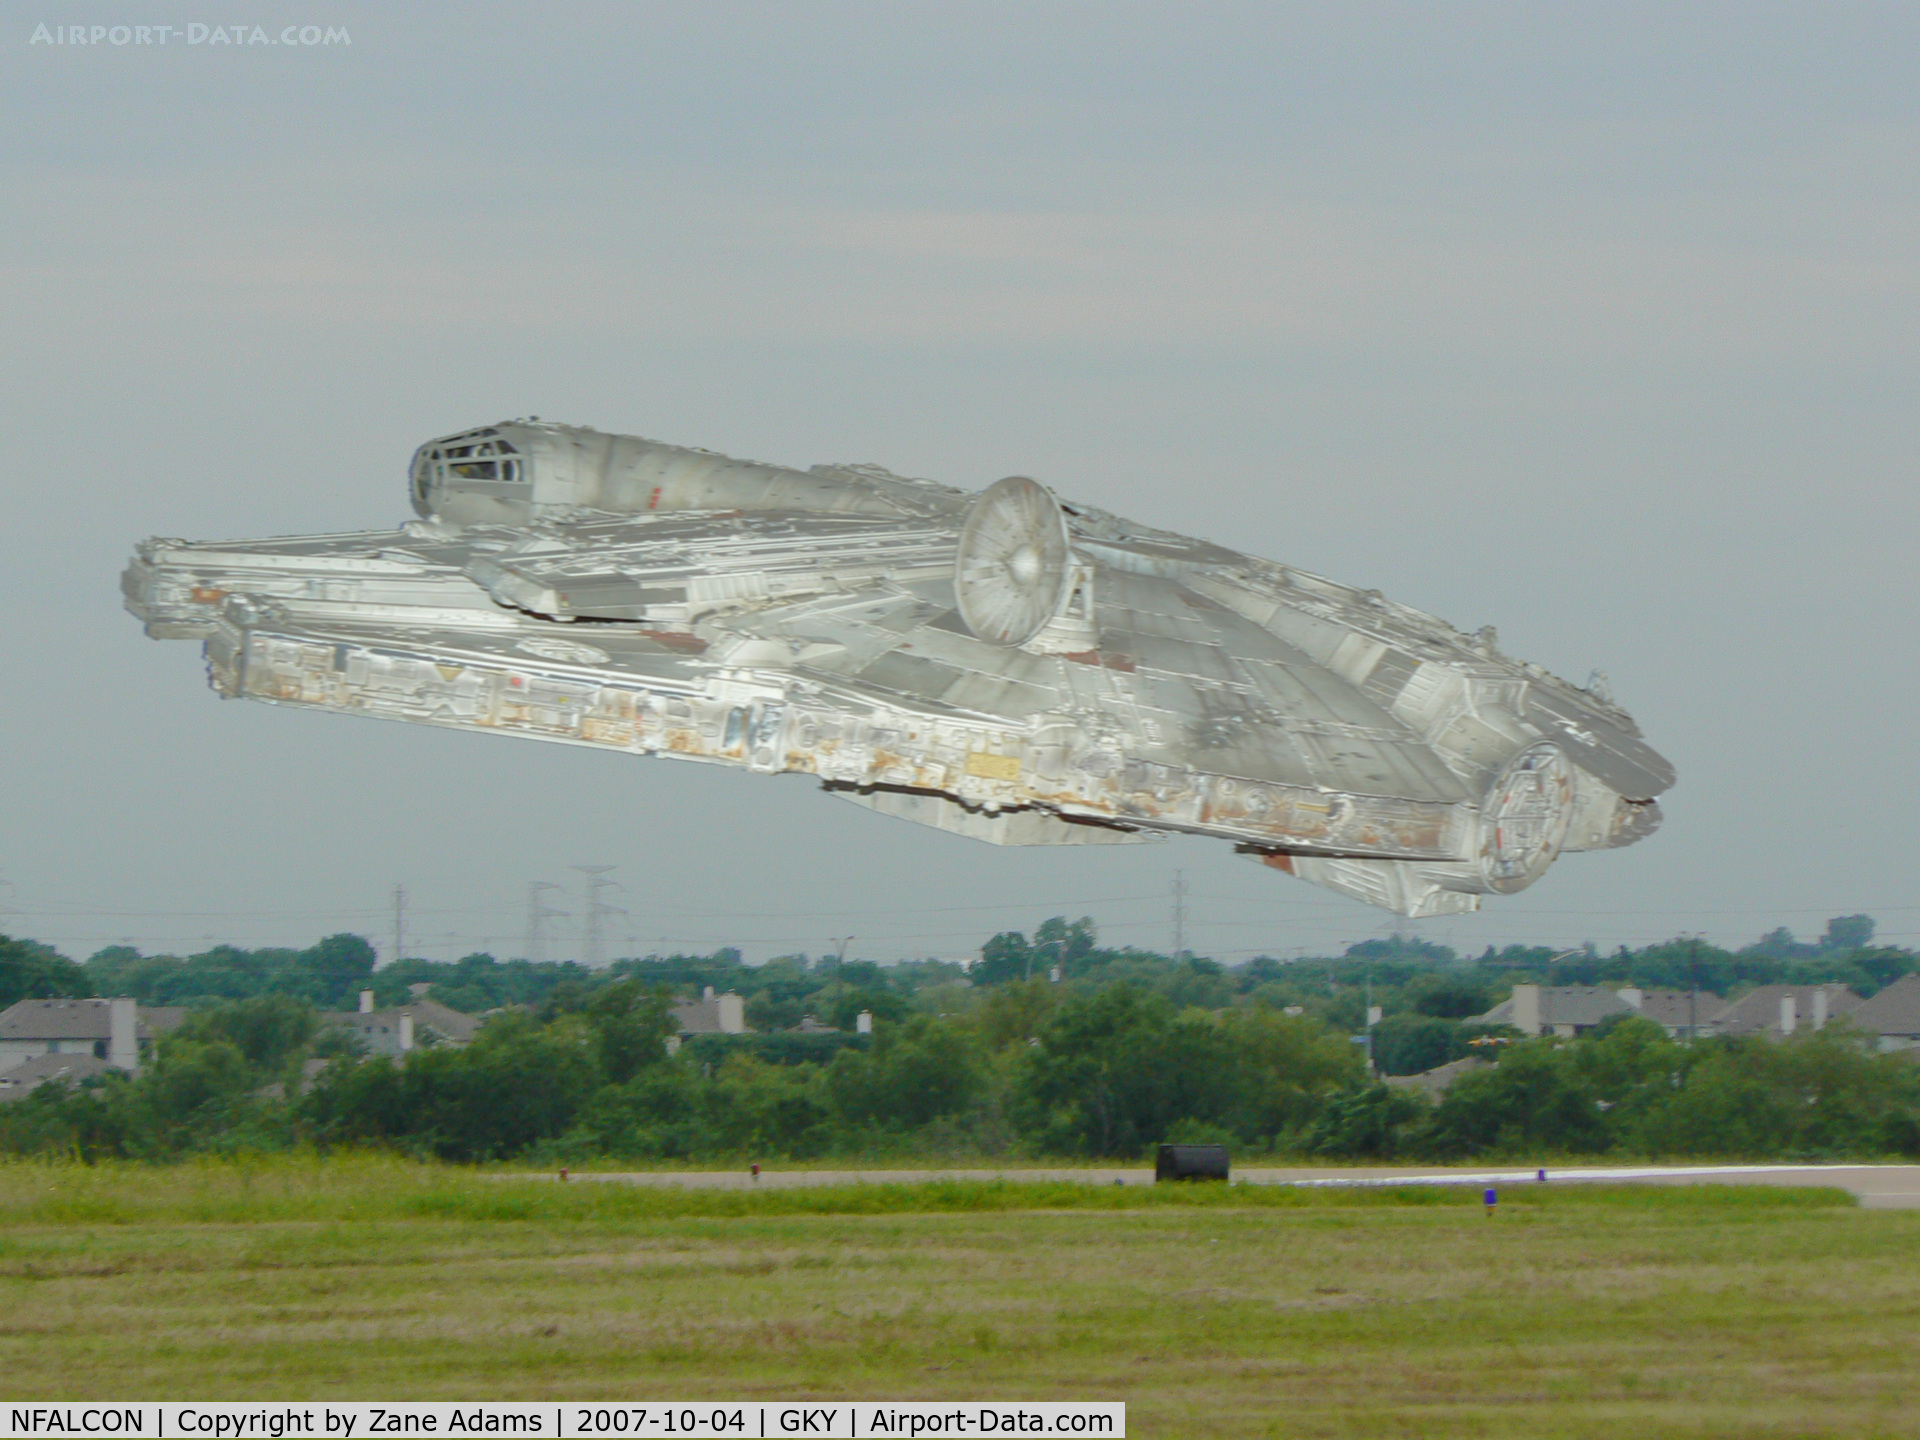 NFALCON, 2060 Corellian Engineering Corporation YT-1300 freighter C/N THX1138, Takeoff from Arlington Muni??? :)